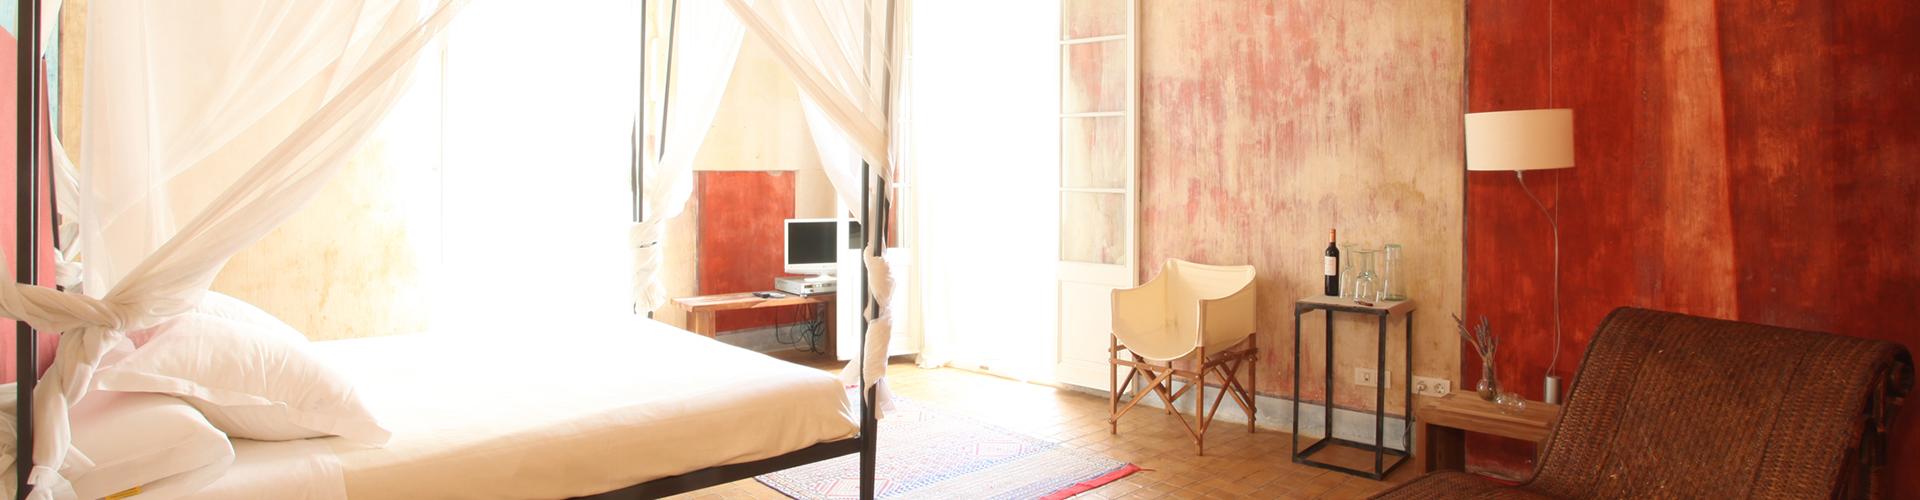 HOTEL TRES SANTS (5)